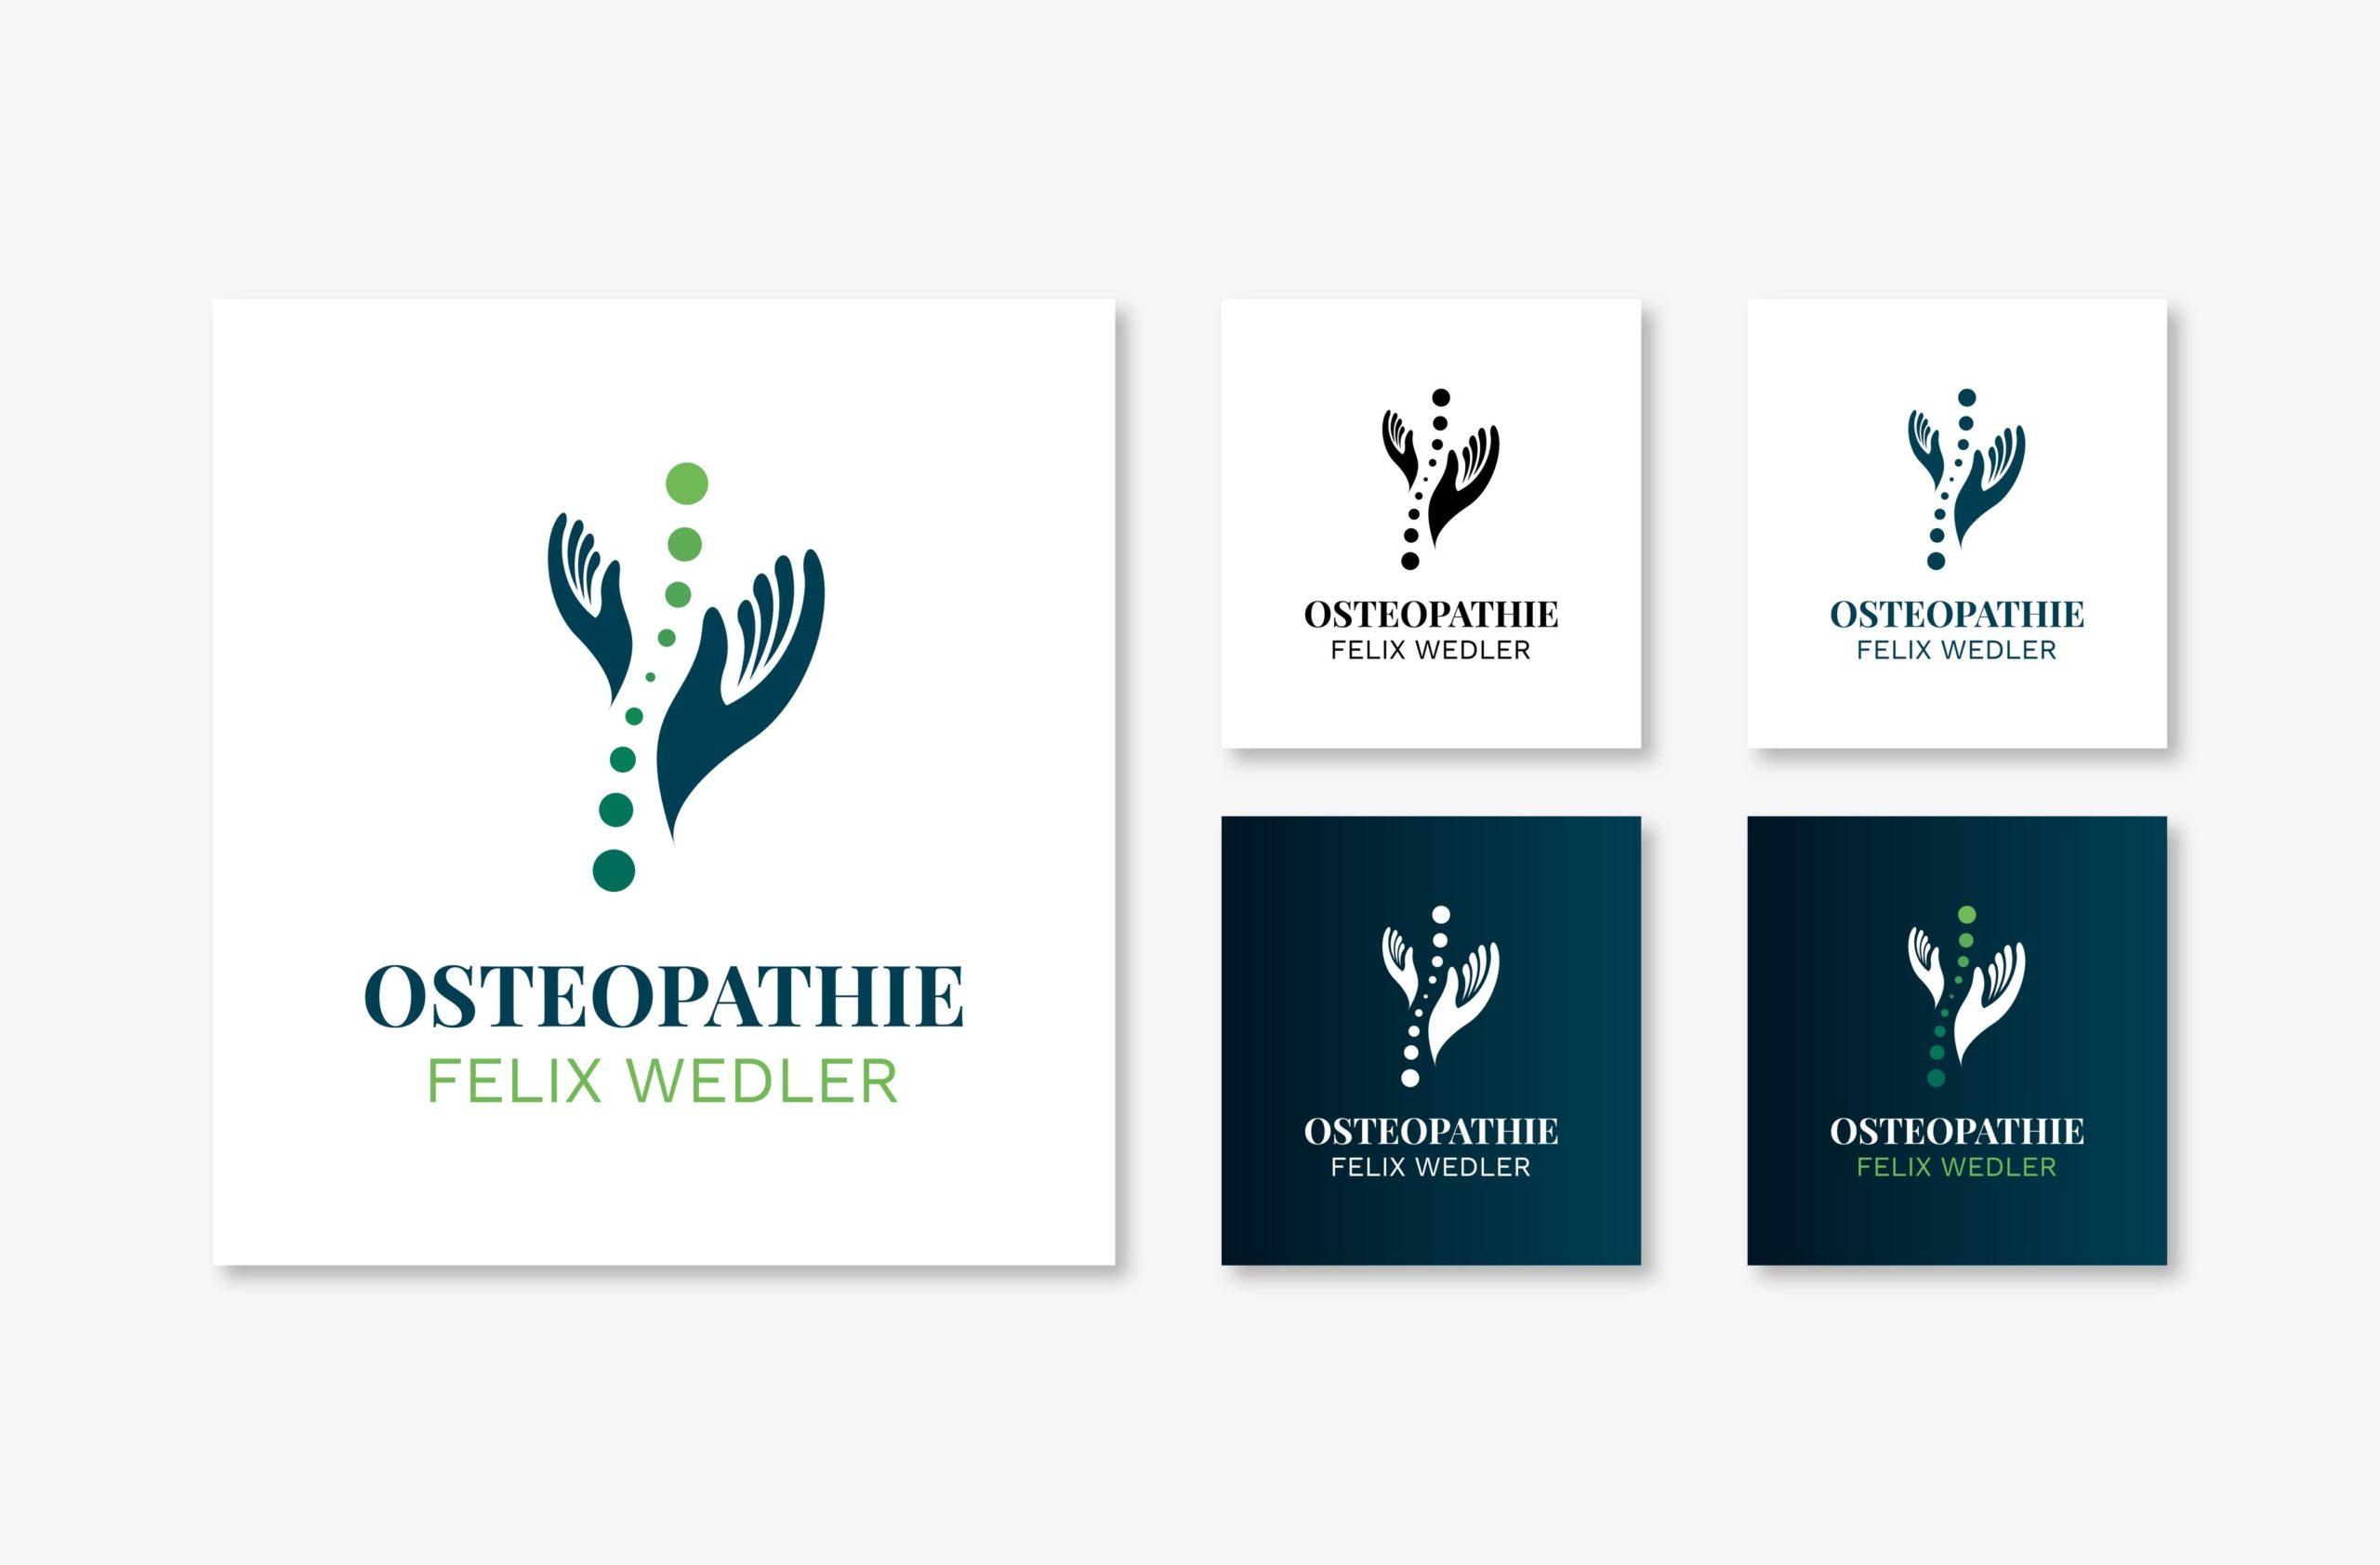 Osteopathie Felix Wedler - Logo